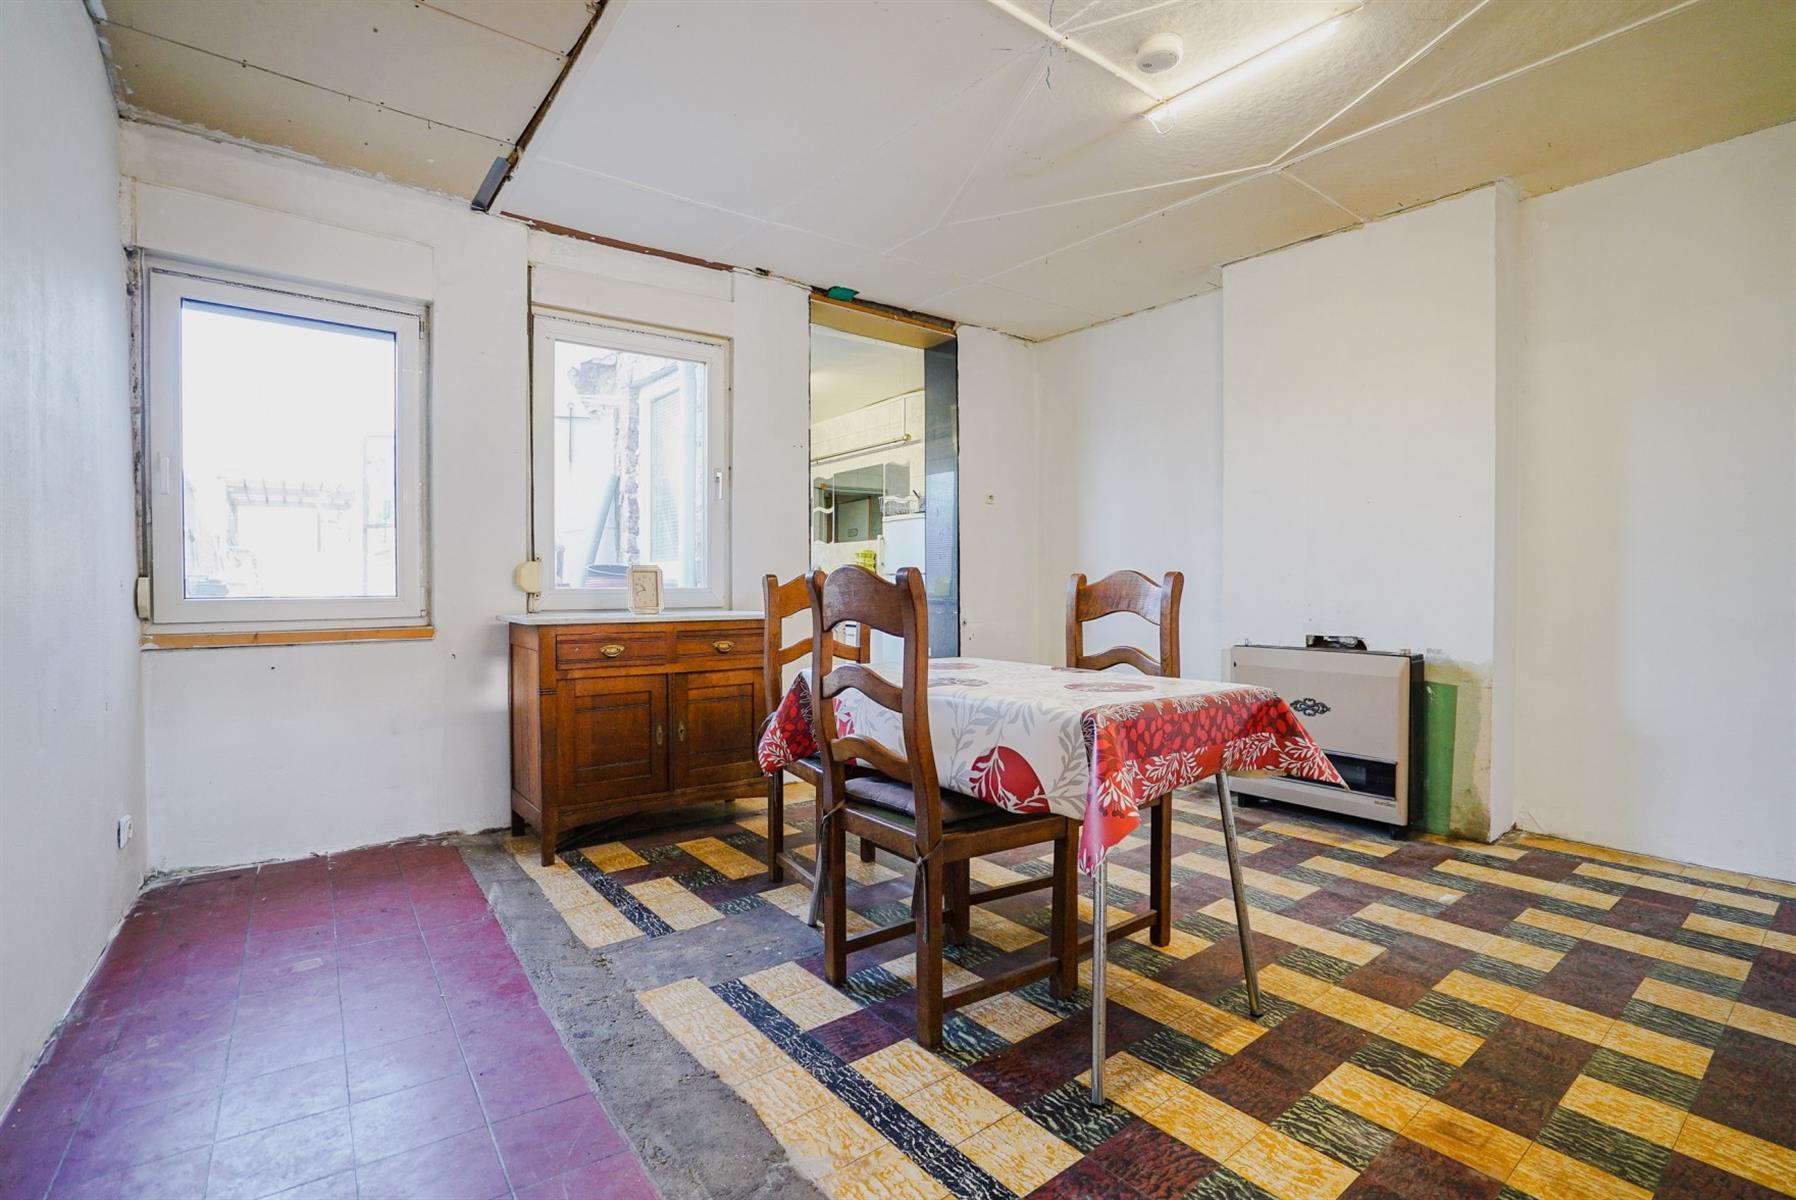 Maison - Oupeye Hermallesous-Argenteau - #4324098-3